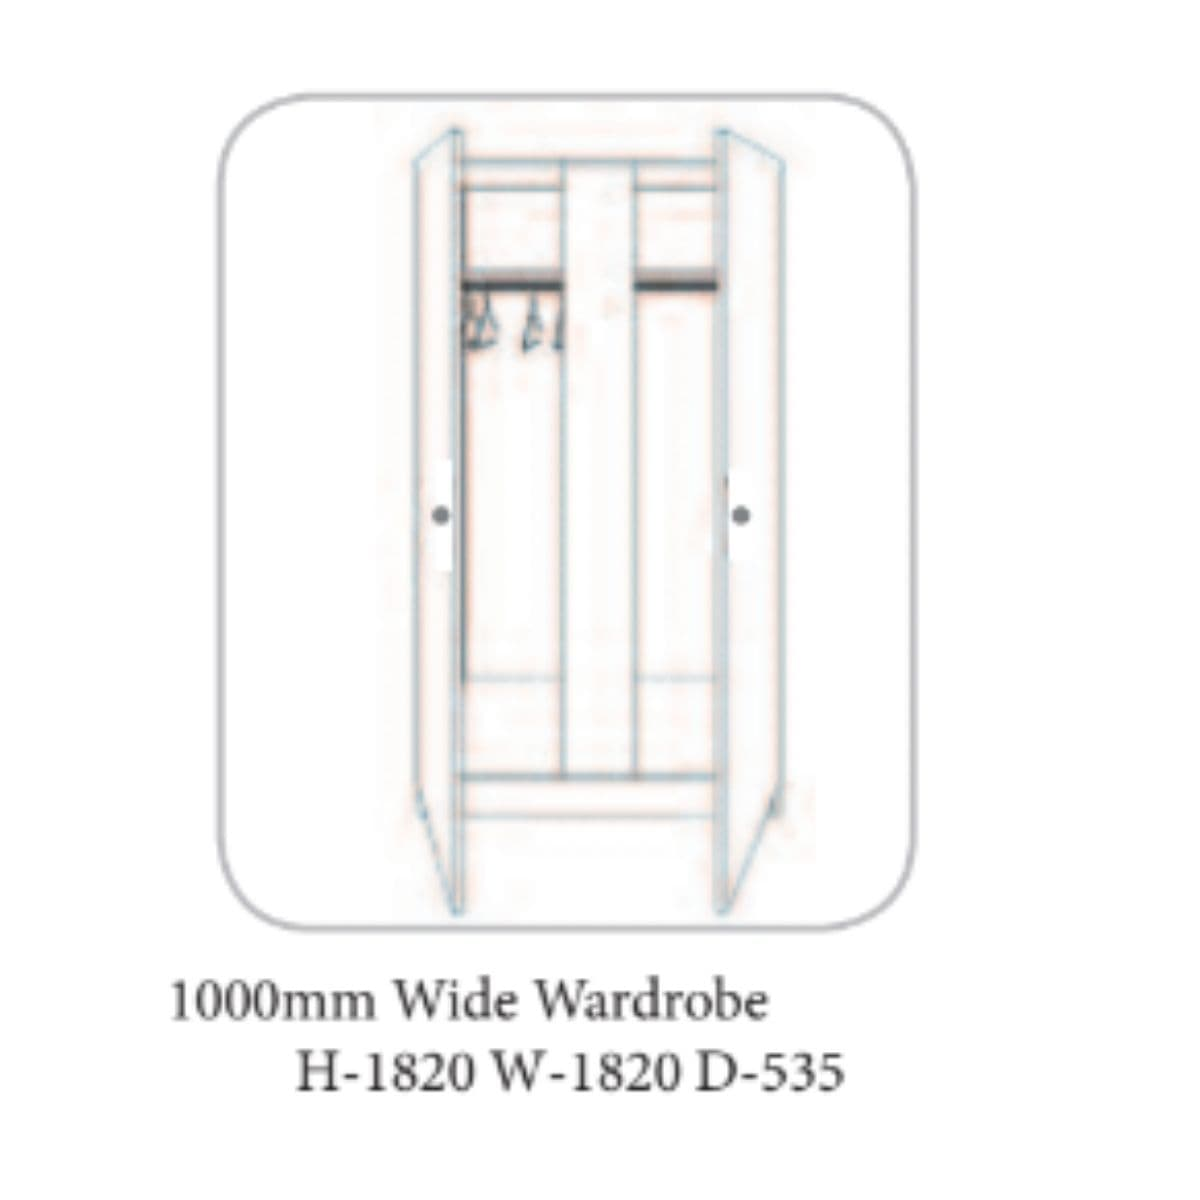 Wales Wardrobe White- 19 Options